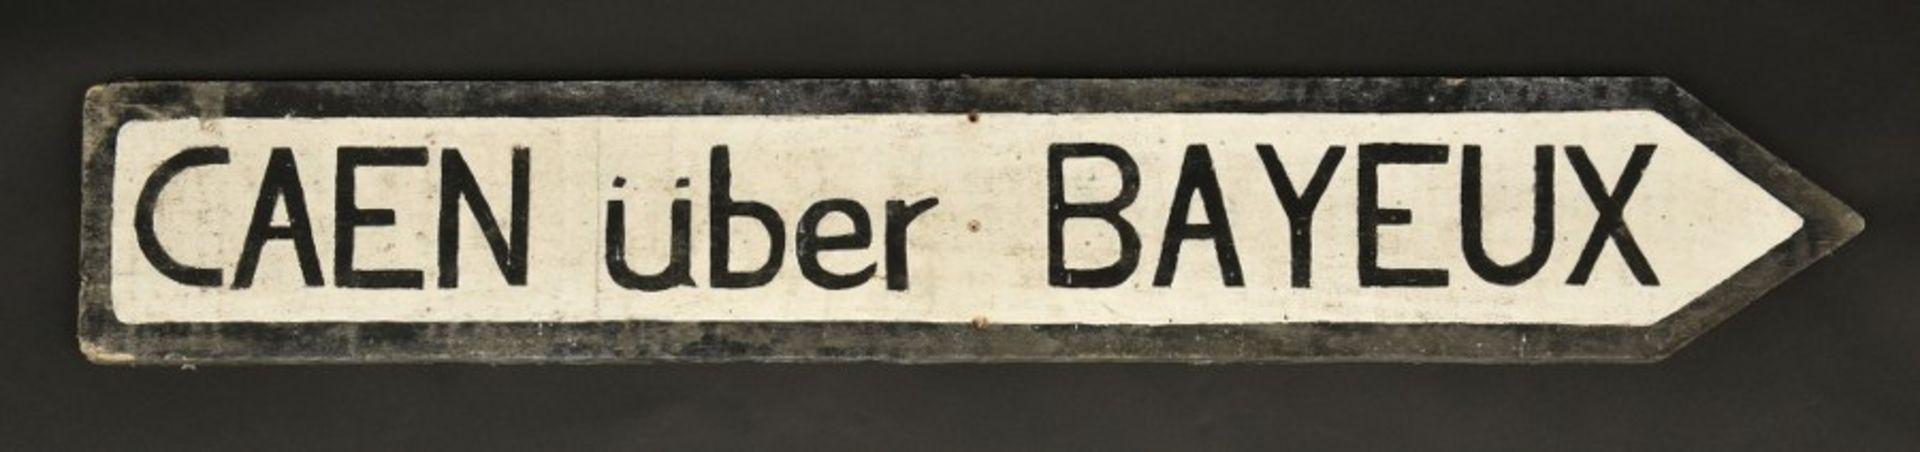 Panneau directionnel Caen über Bayeux. Directional sign Caen über Bayeux.En bois, fond peint en